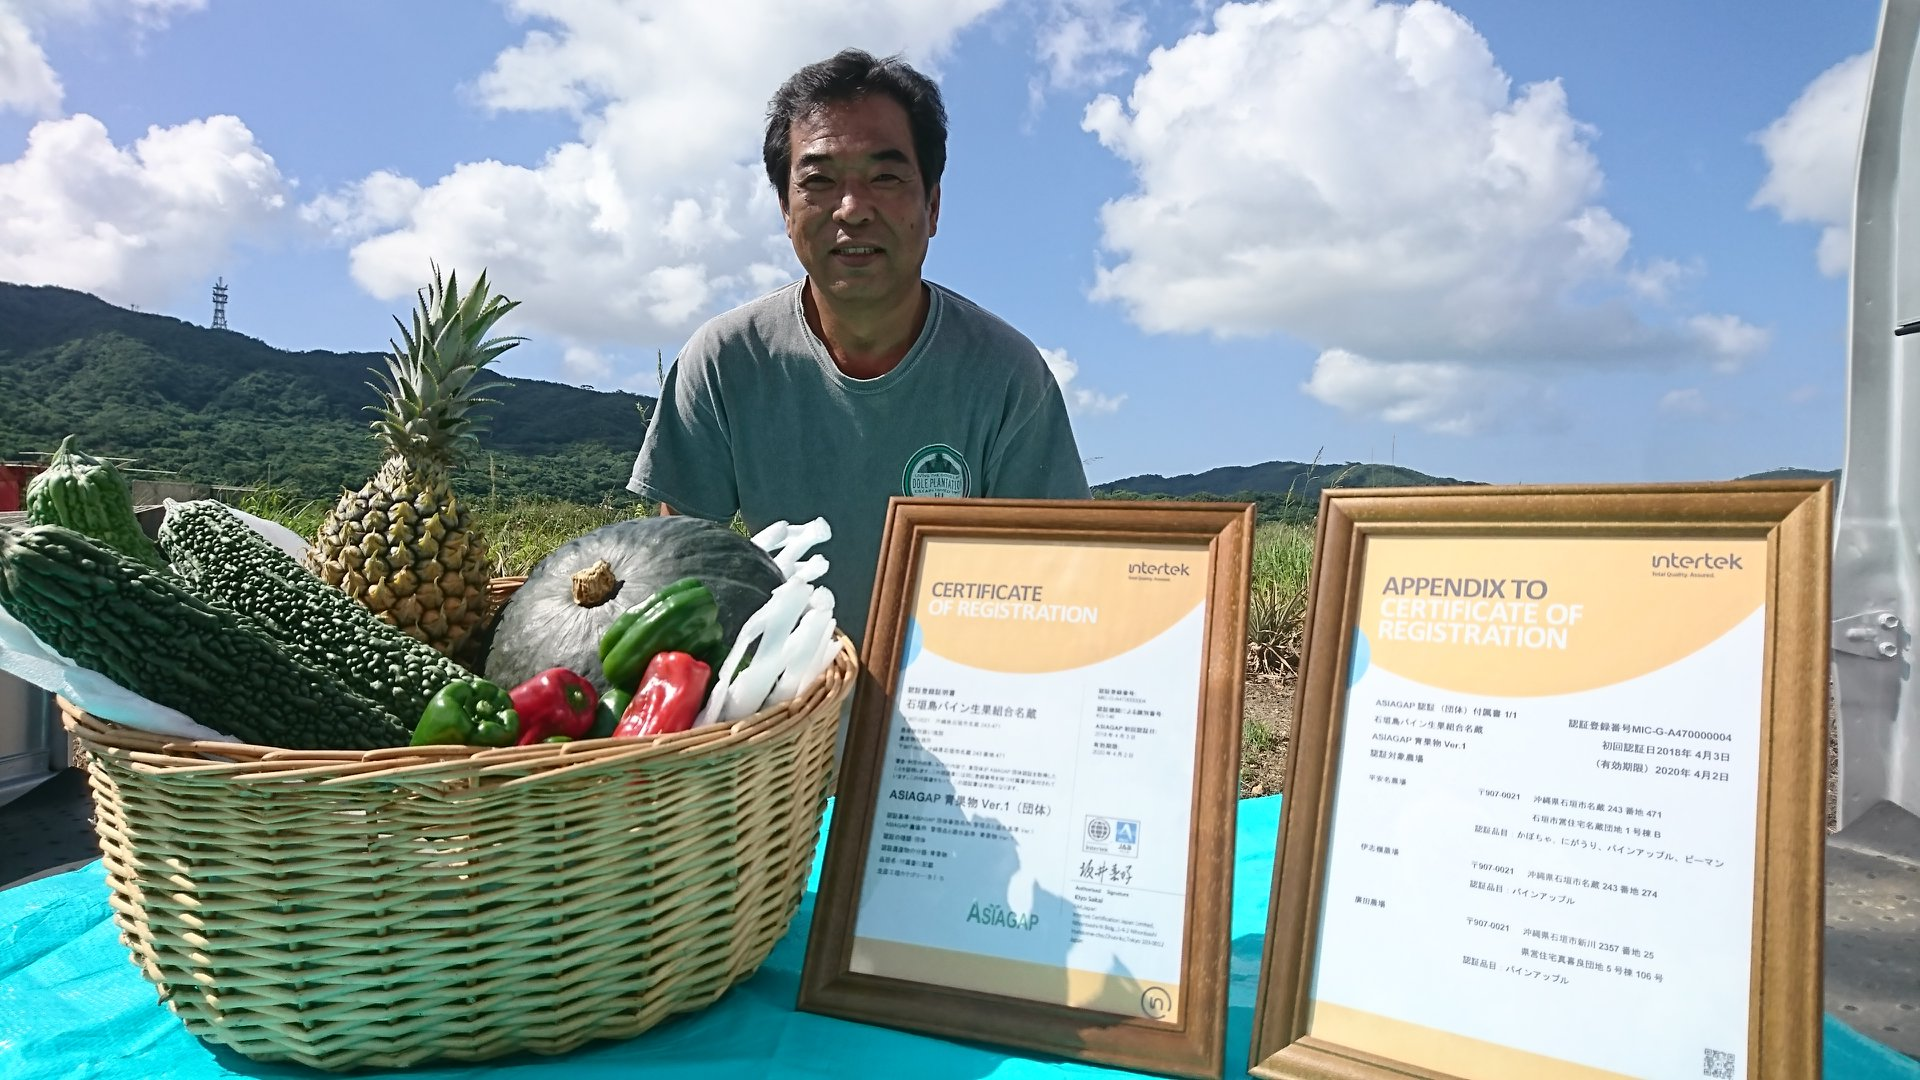 About us 環境に配慮した安全・安心な島の野菜・果物を作っています。